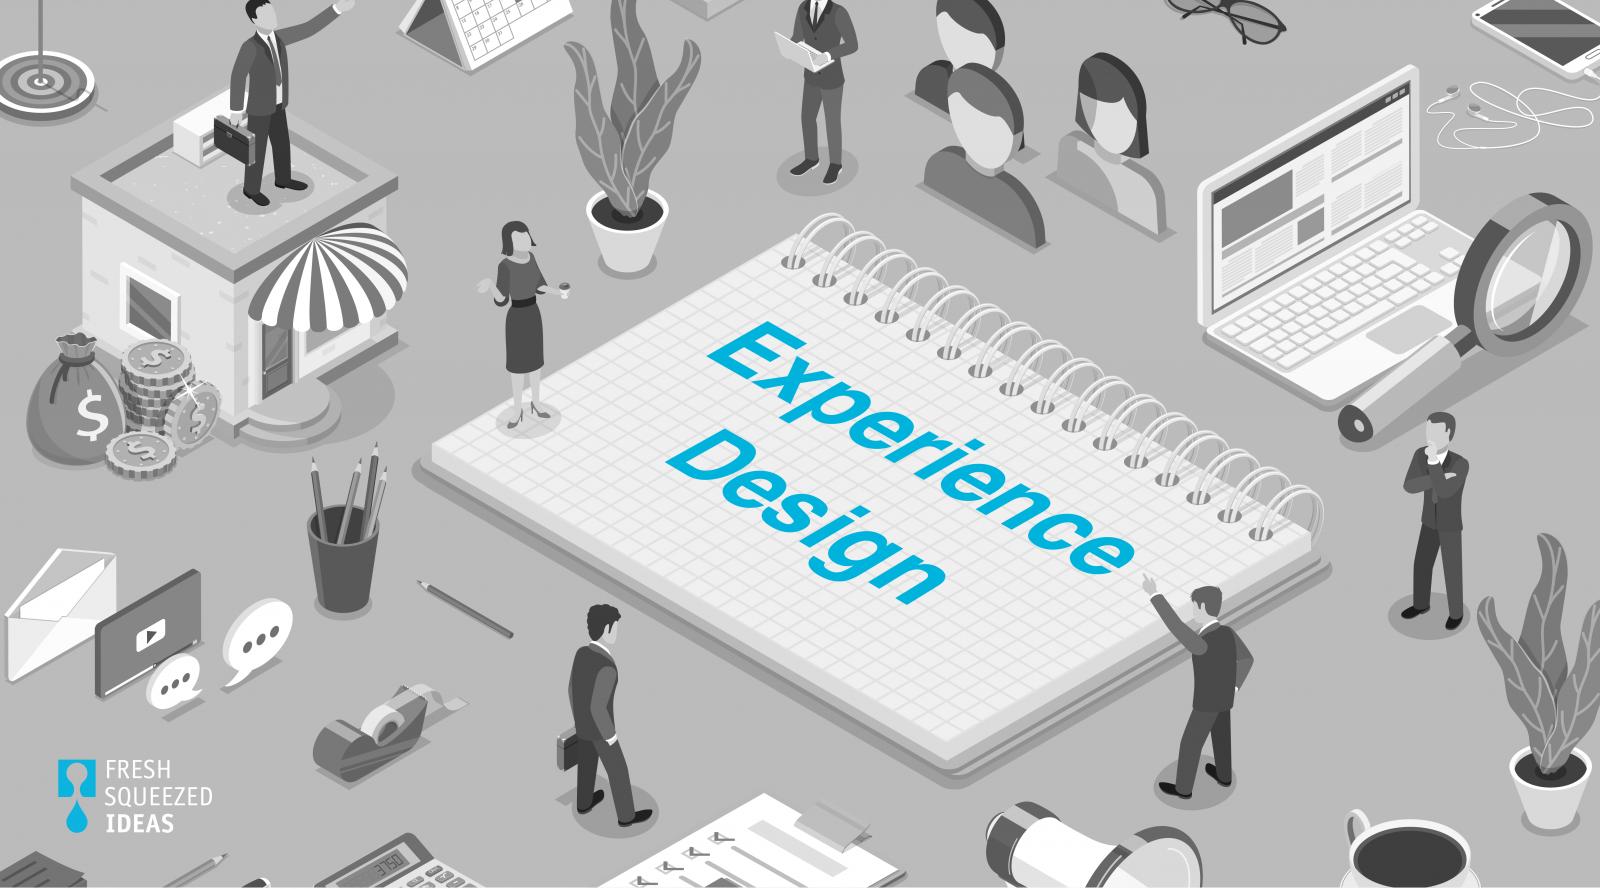 Experience Design